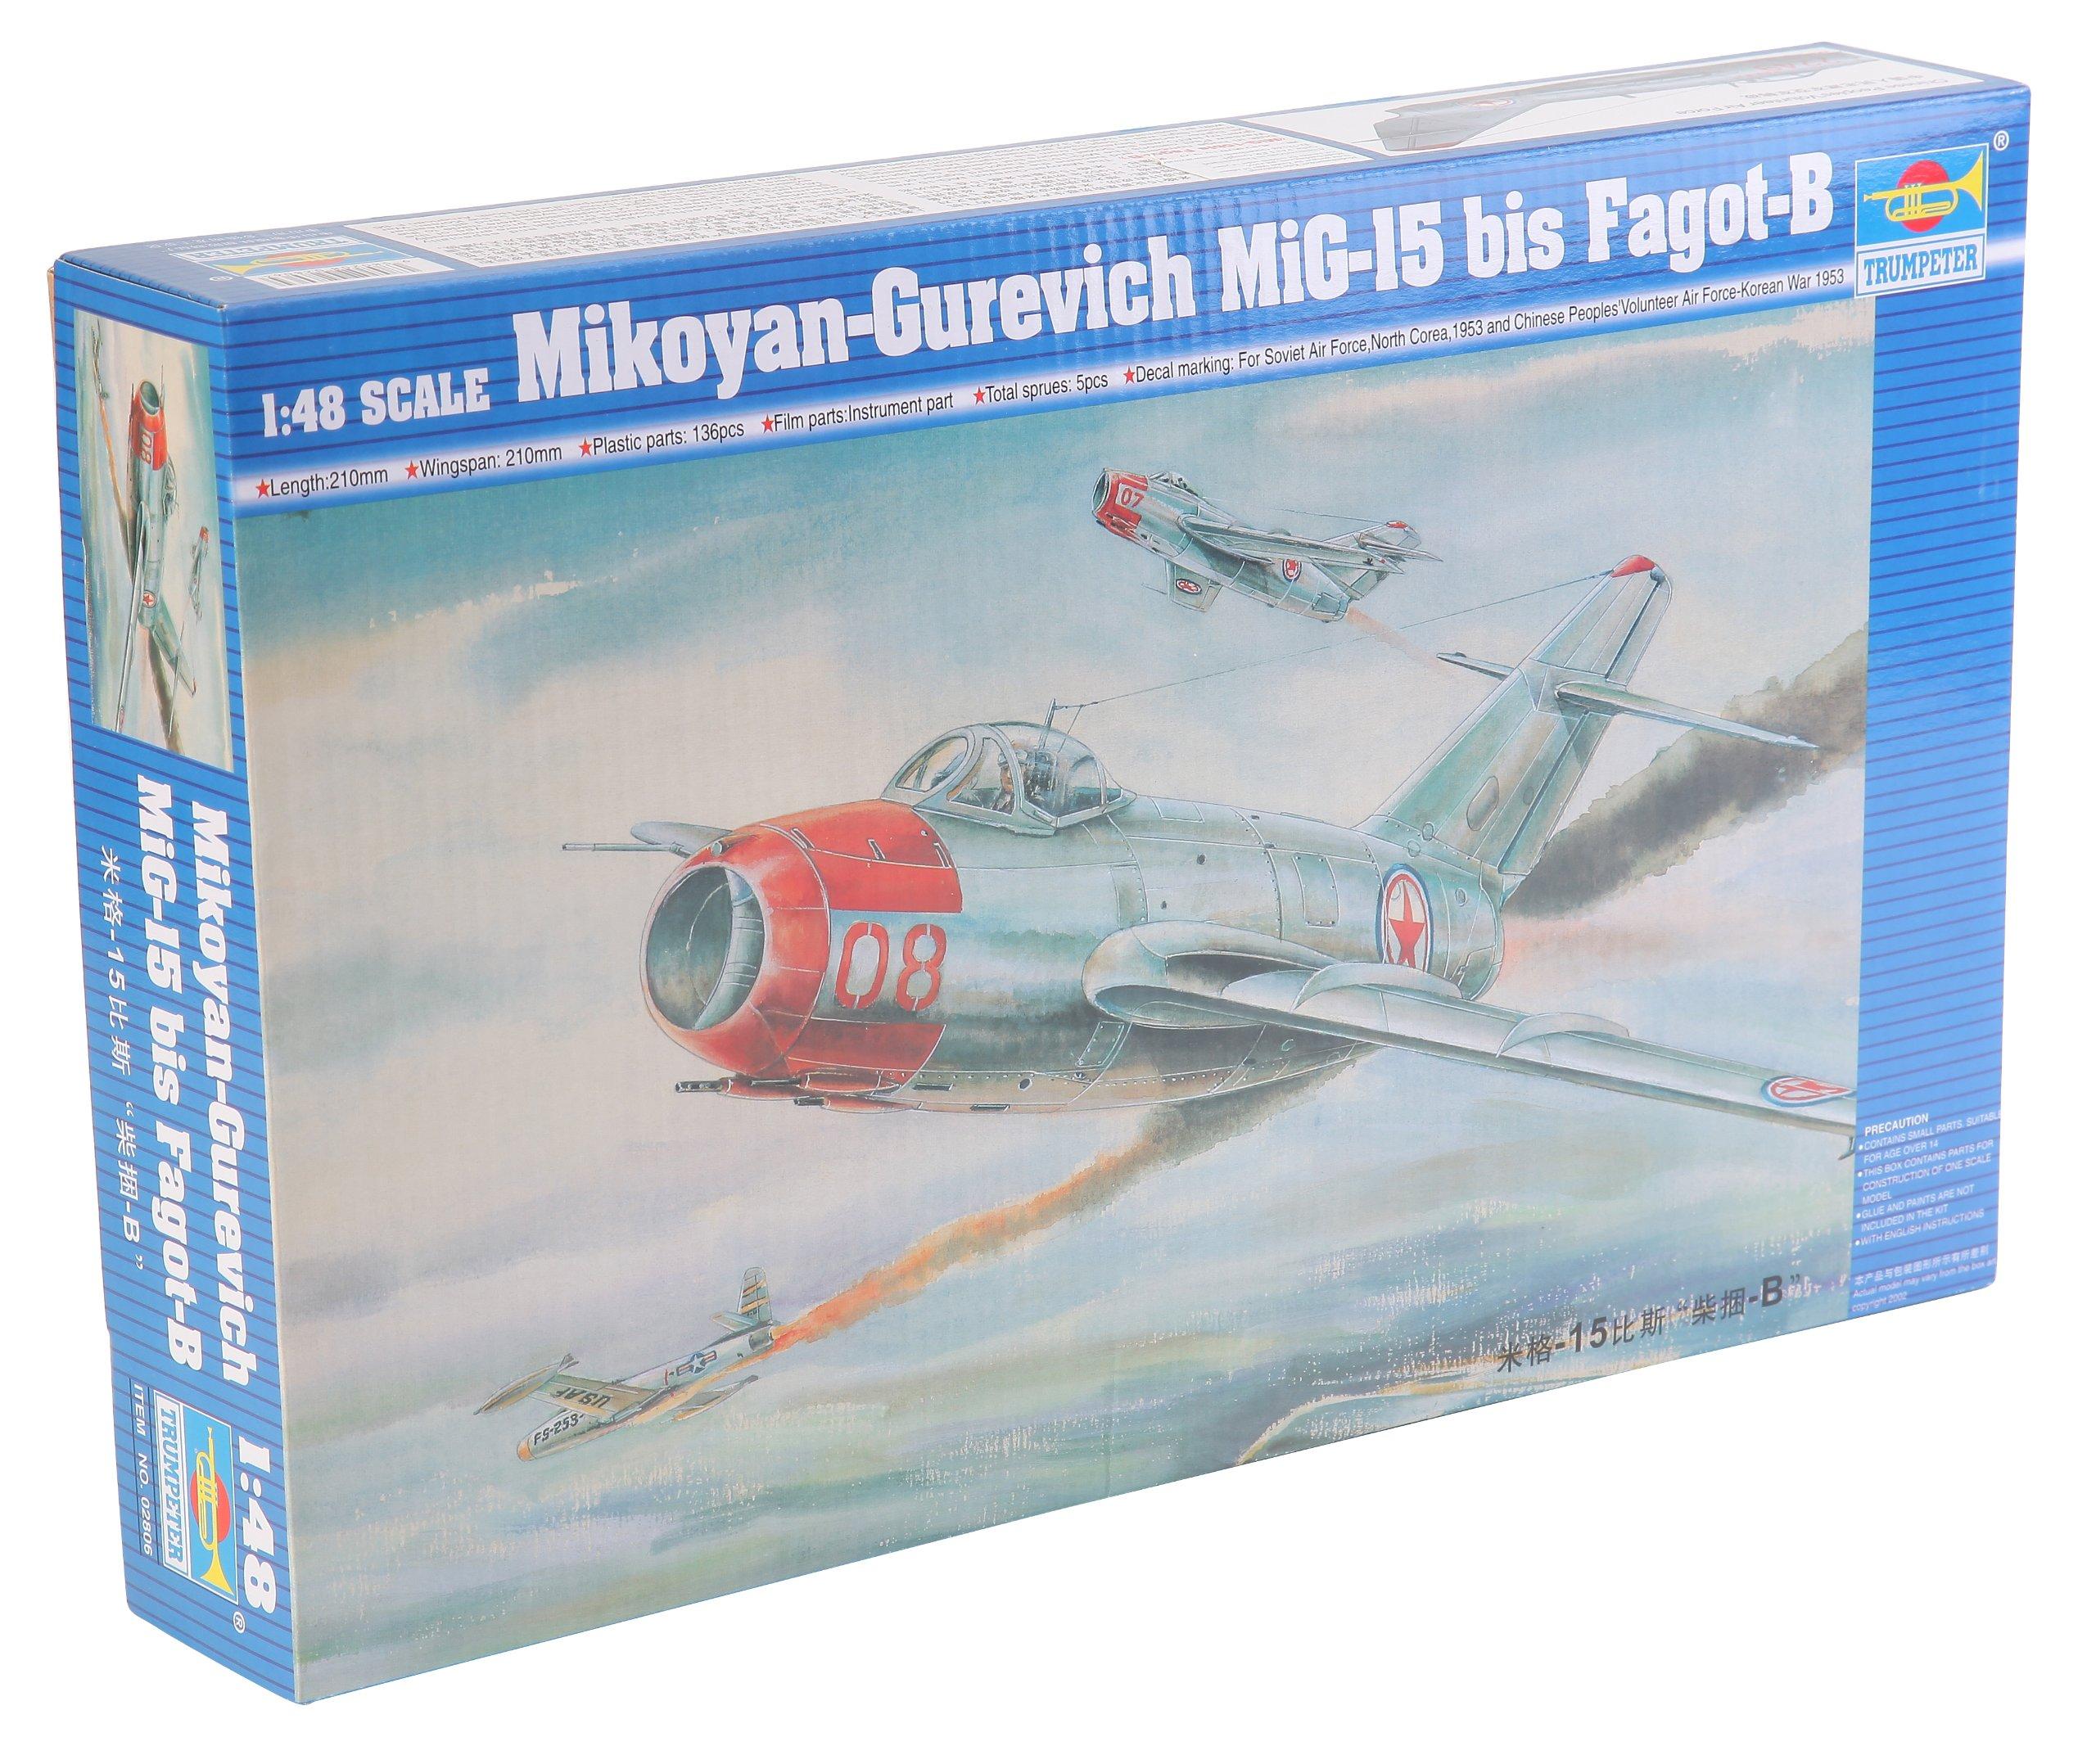 TAMIYA MIG-19 FARMER Jet Fighter 1//100 Scale Aircraft Kit 61609